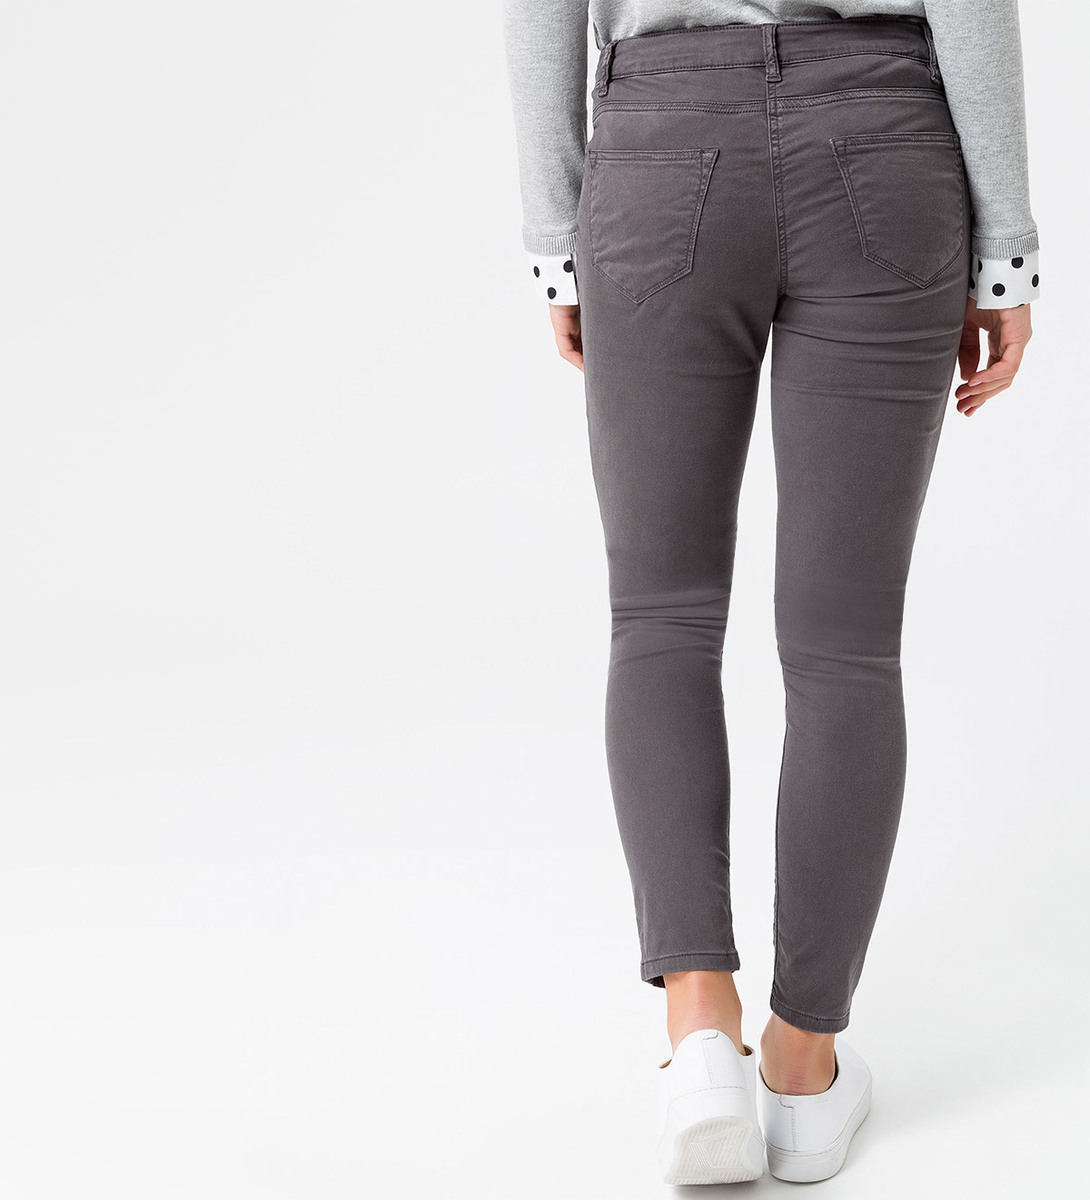 Jeans im 5-Pocket-Style in slate grey